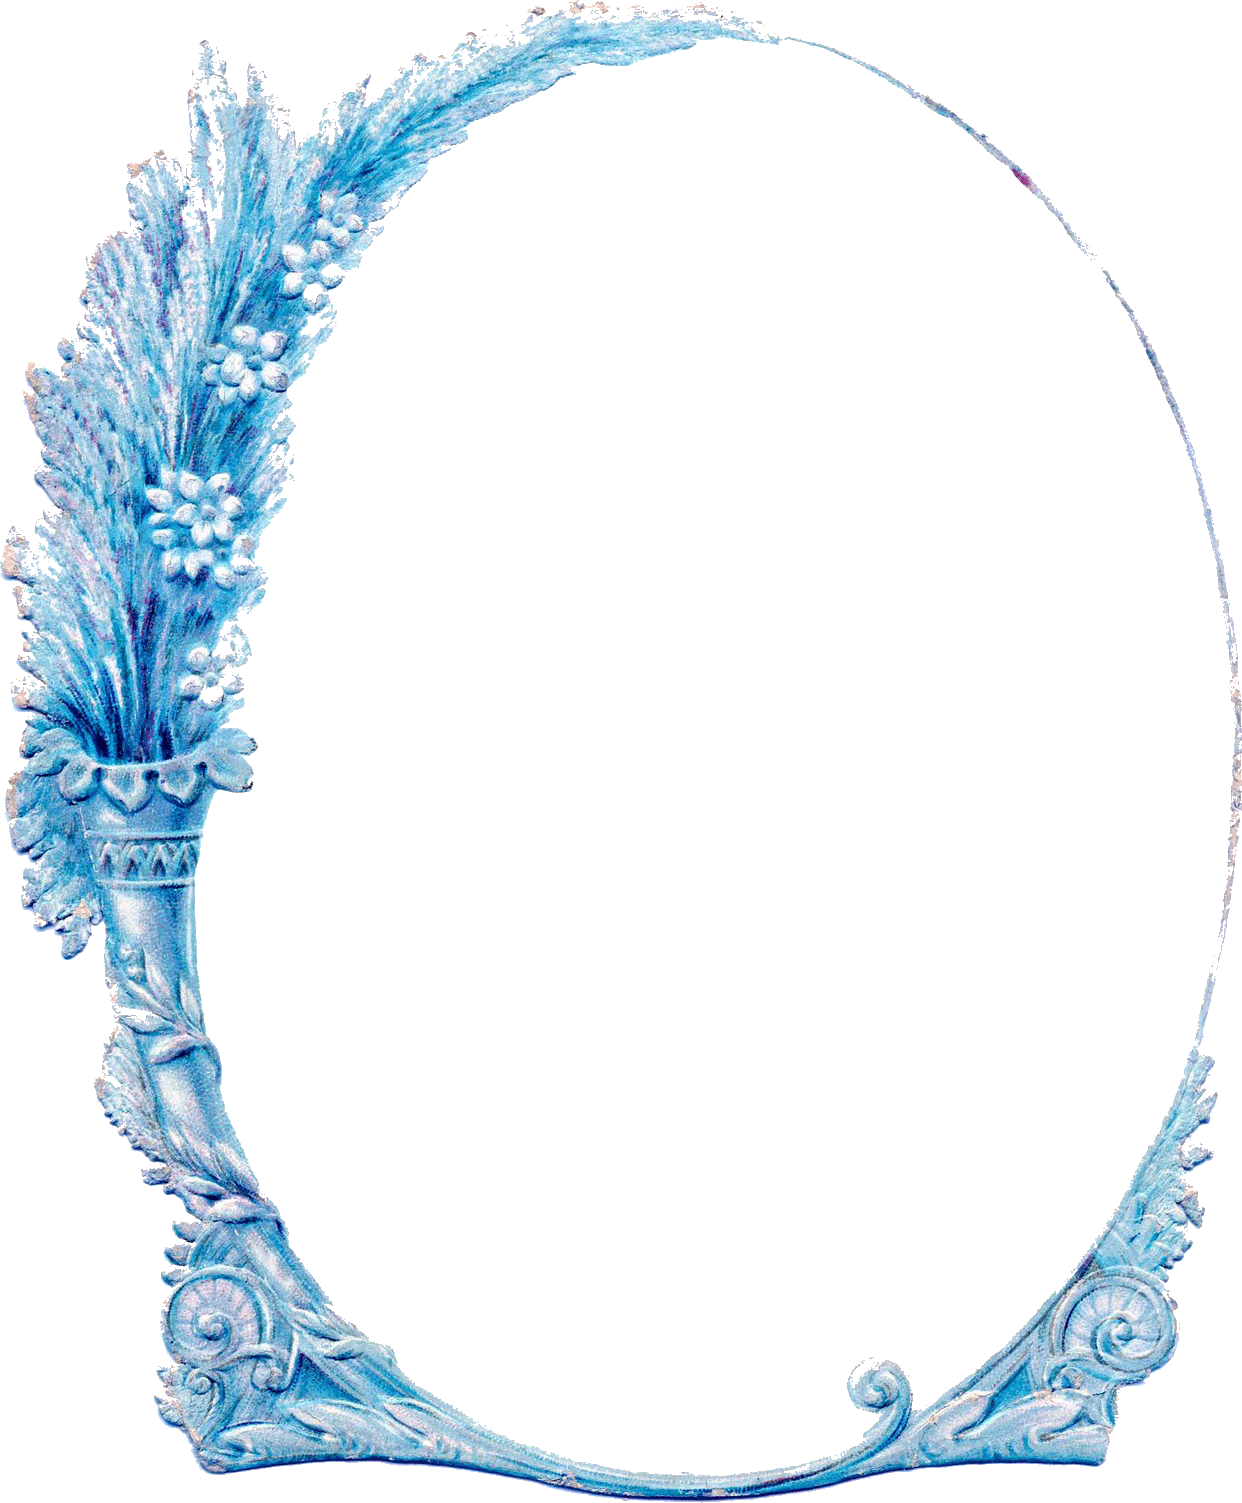 Picture Frames Paper Clip art - oval border 1242*1503 transprent Png ... picture freeuse download